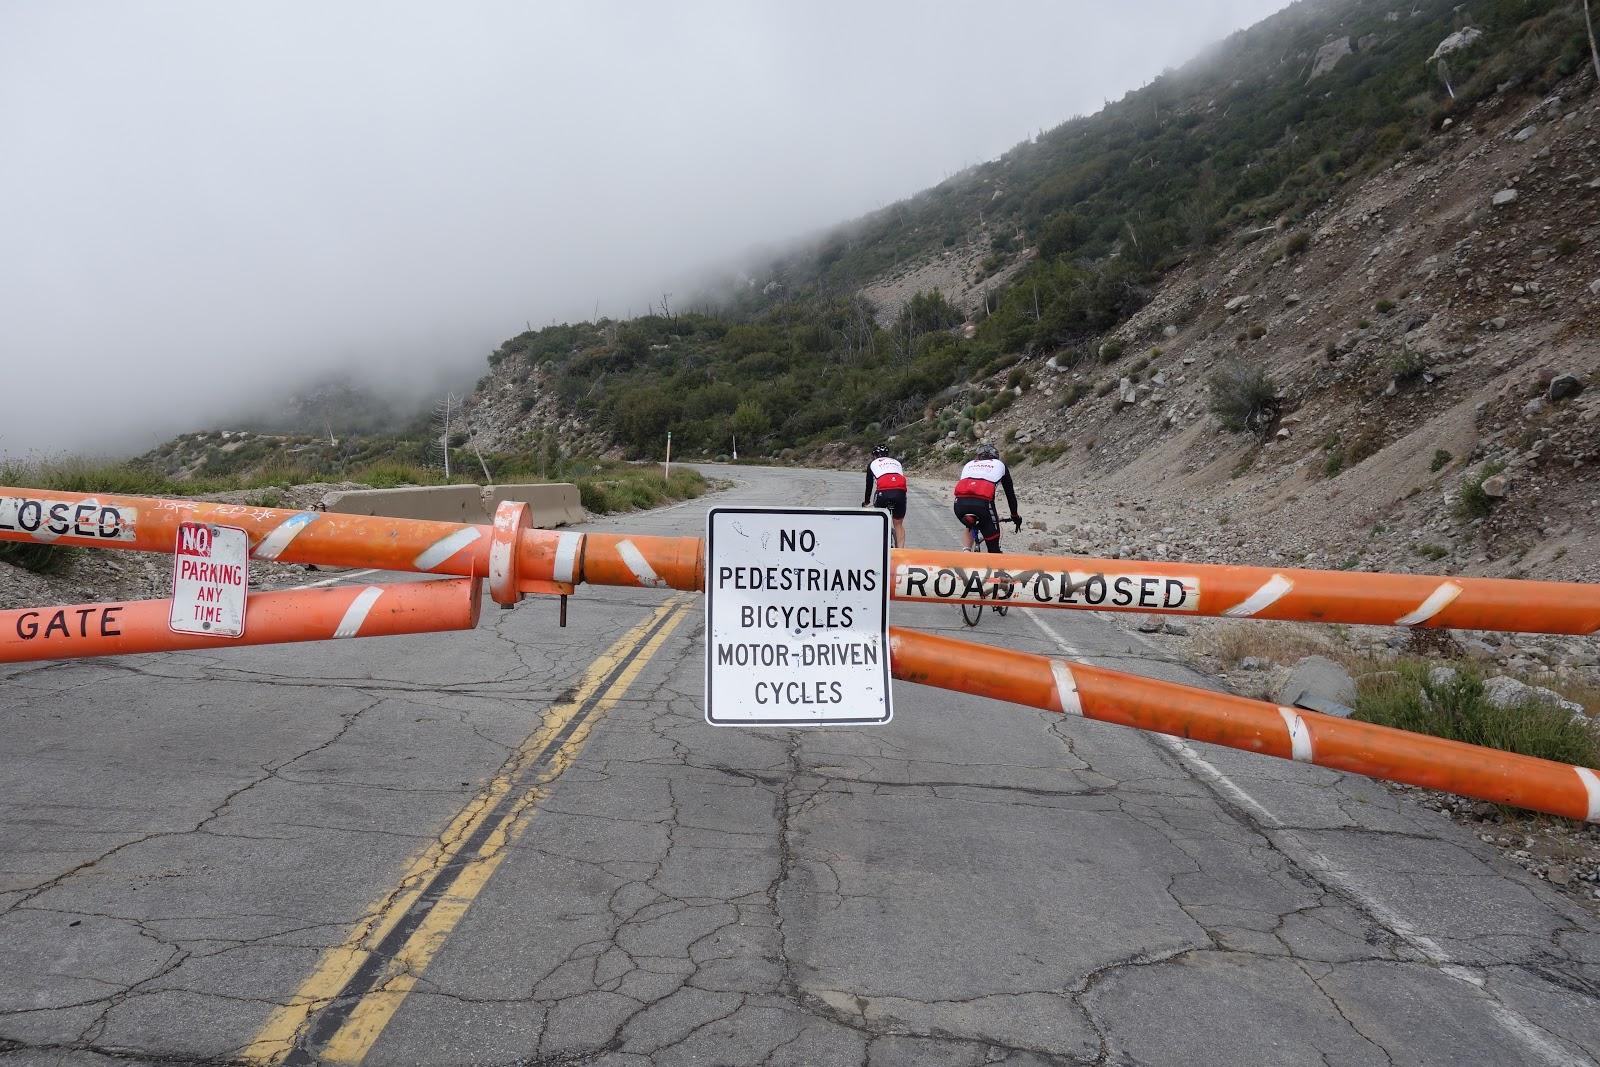 Dawson Saddle bicycle climb - gate and sign prohibiting vehicle and bike traffic.